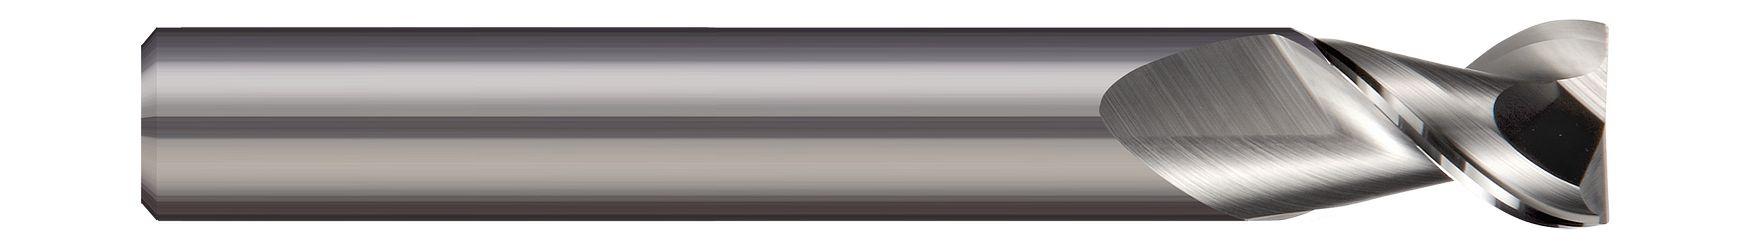 tool-details-ASM-437-2